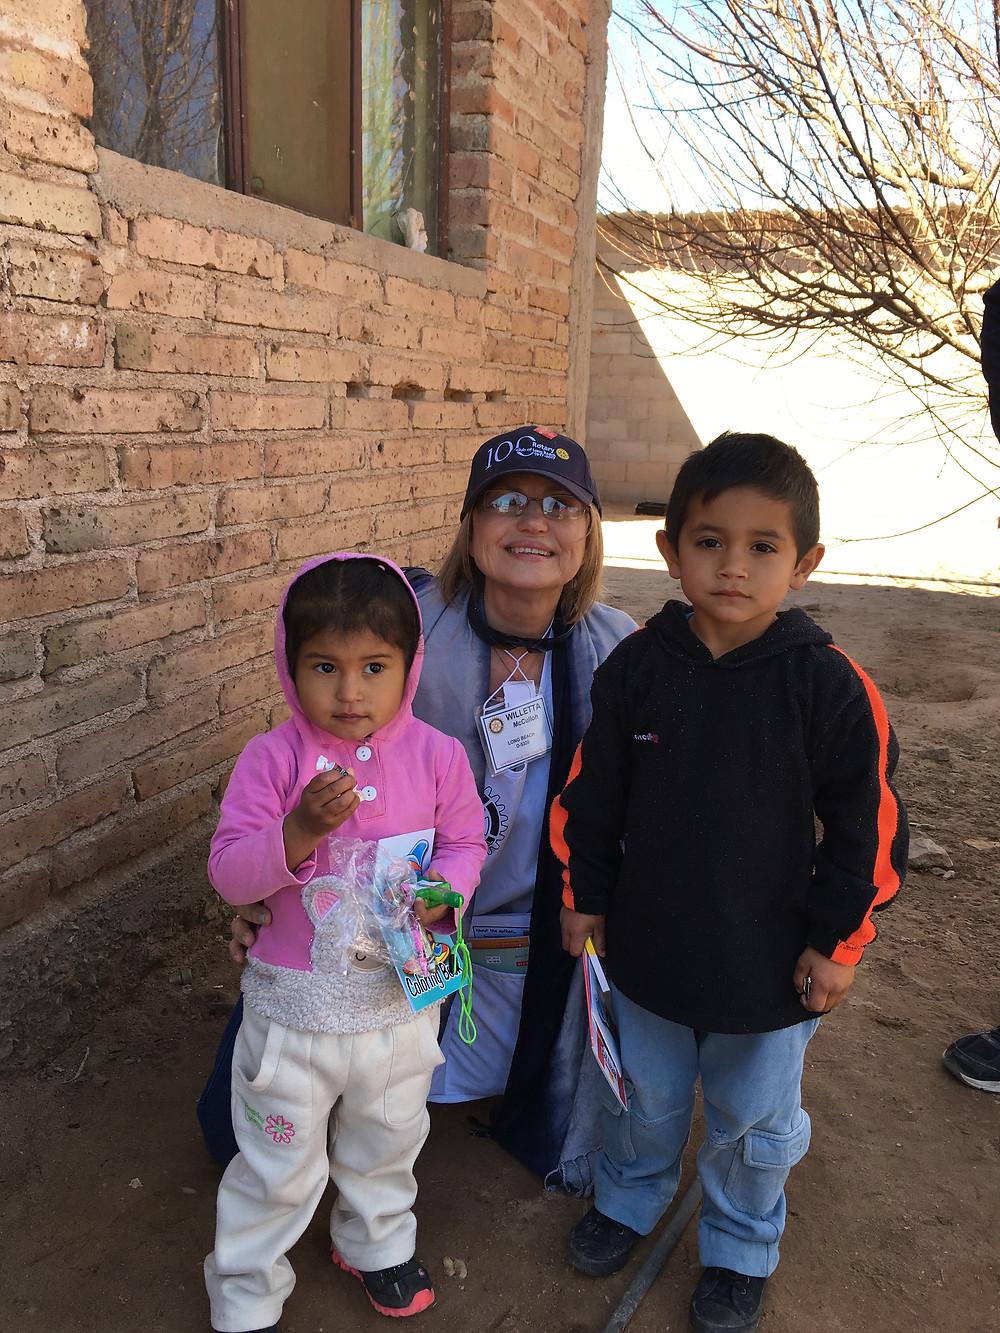 Environ's Willetta McCulloh donates time in Caborca, Mexico administering vaccines.